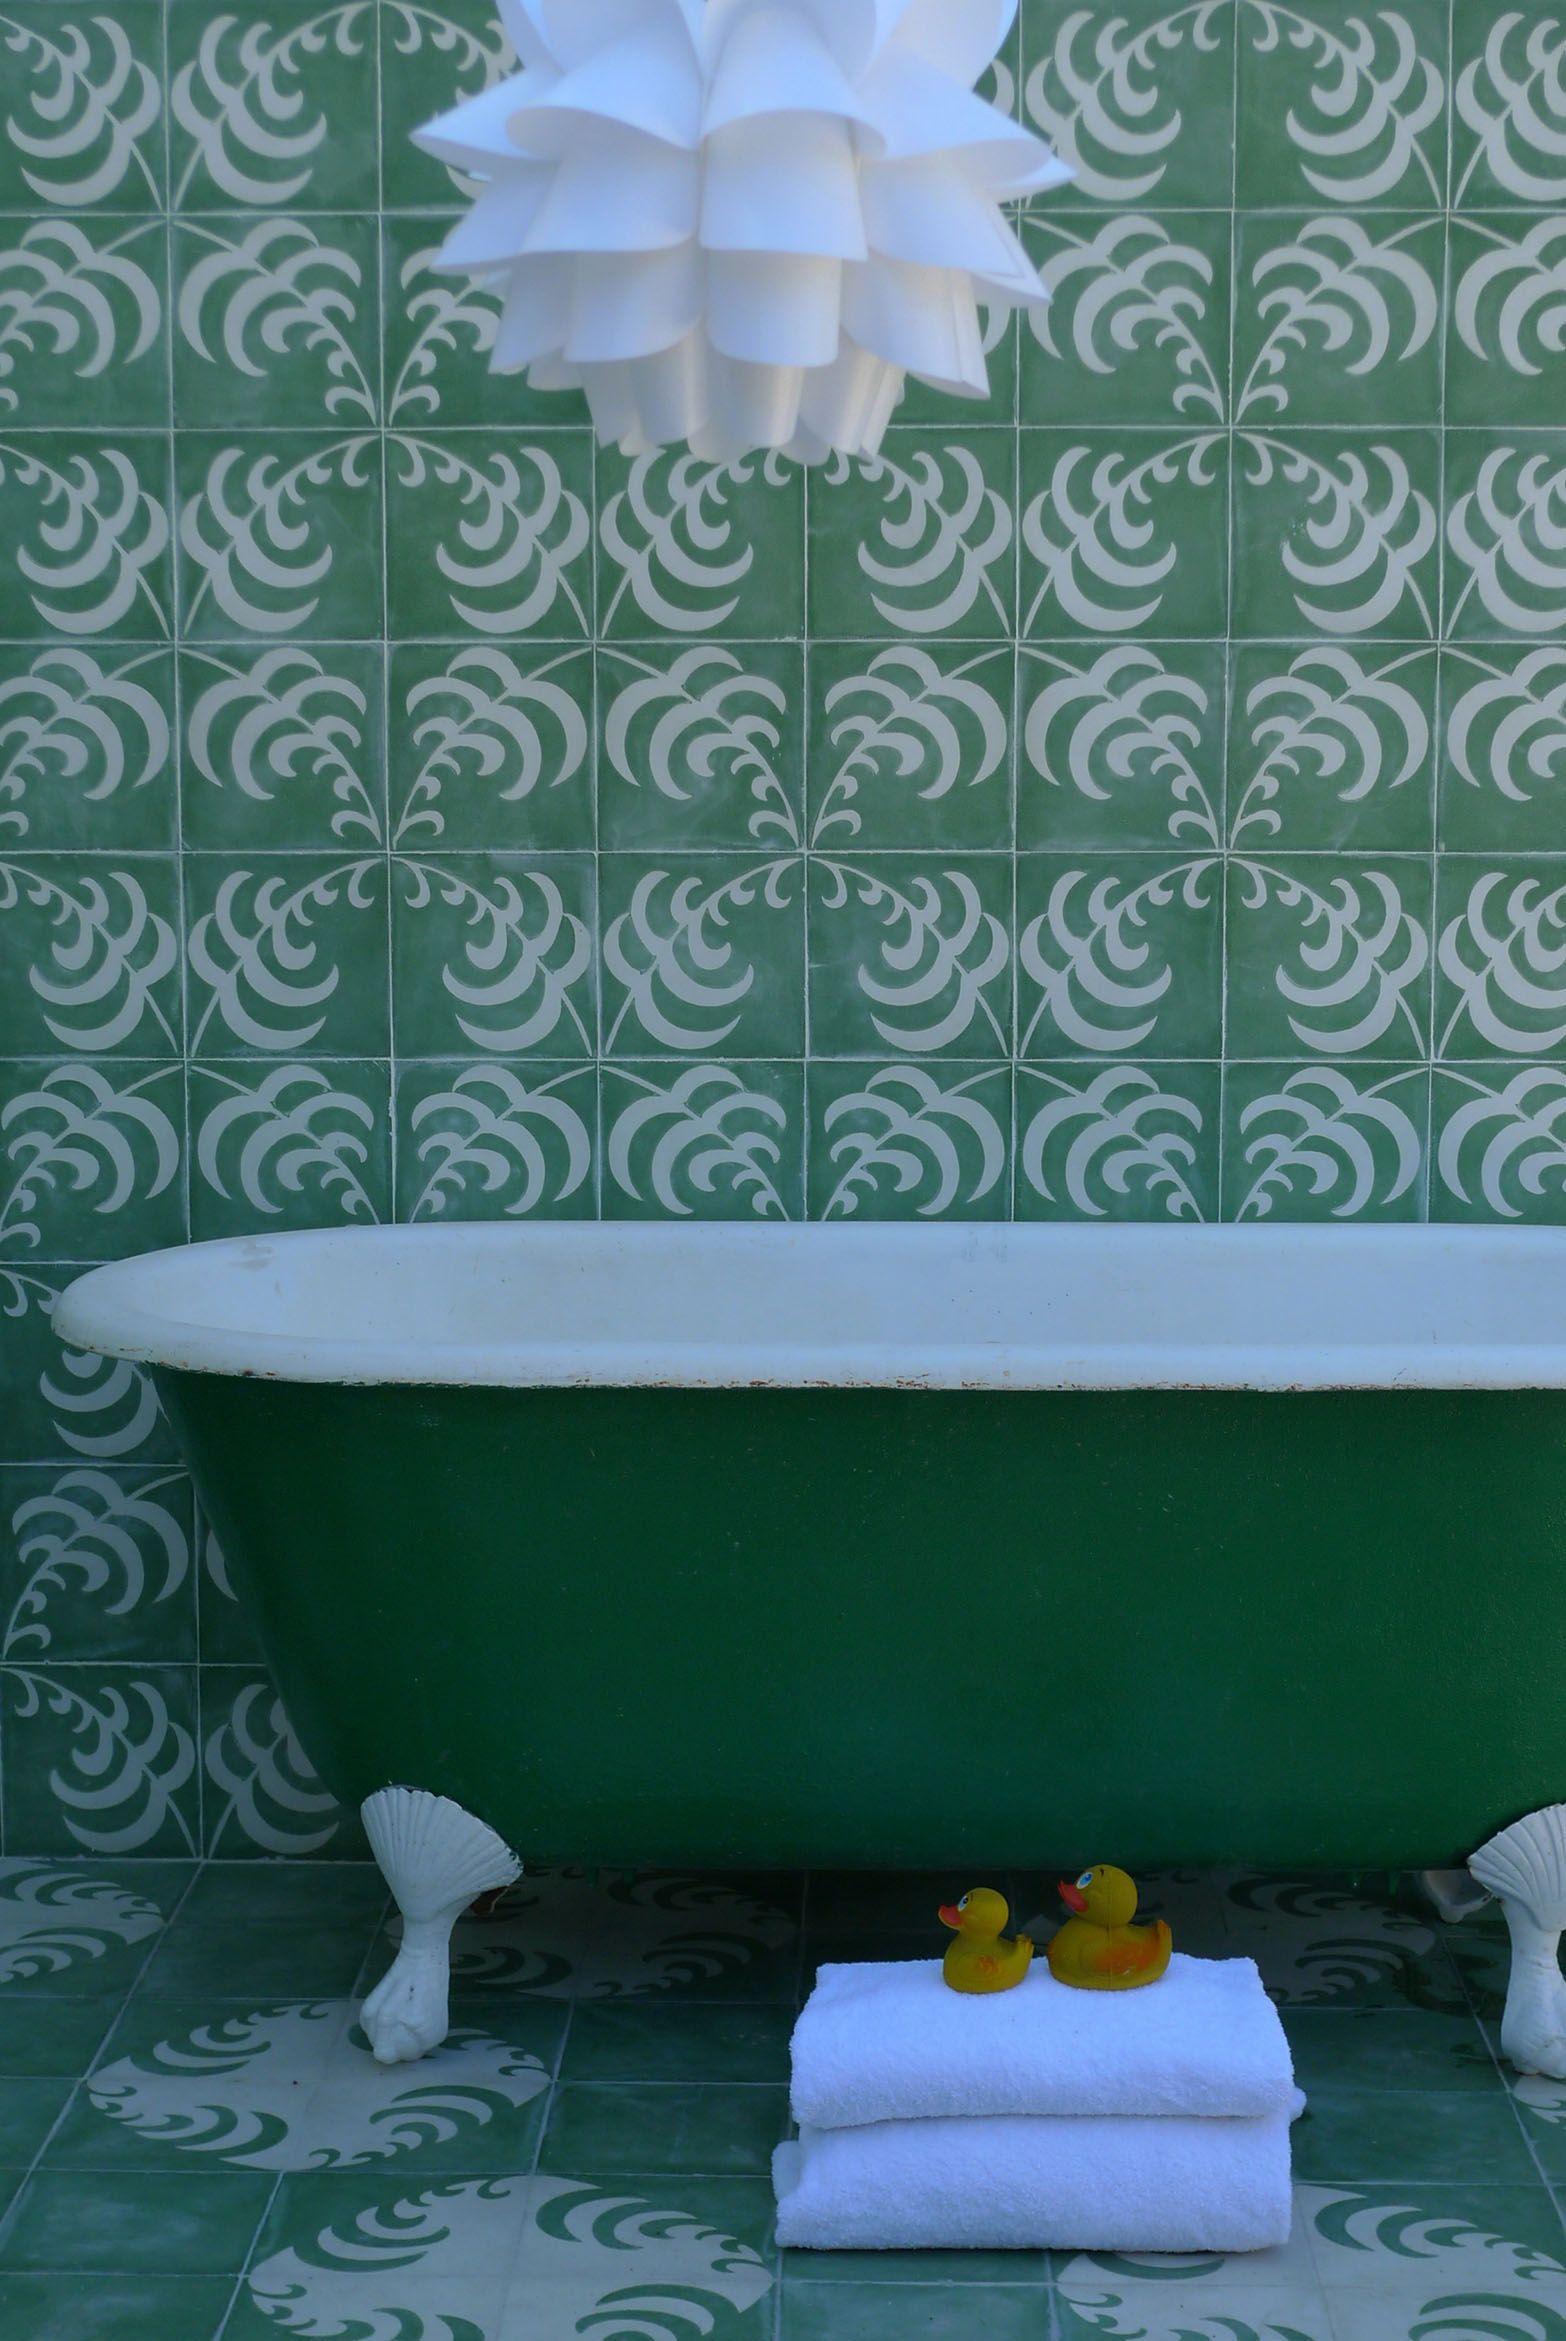 popham design :: cement tiles :: handmade in morocco   Formal A-tile ...